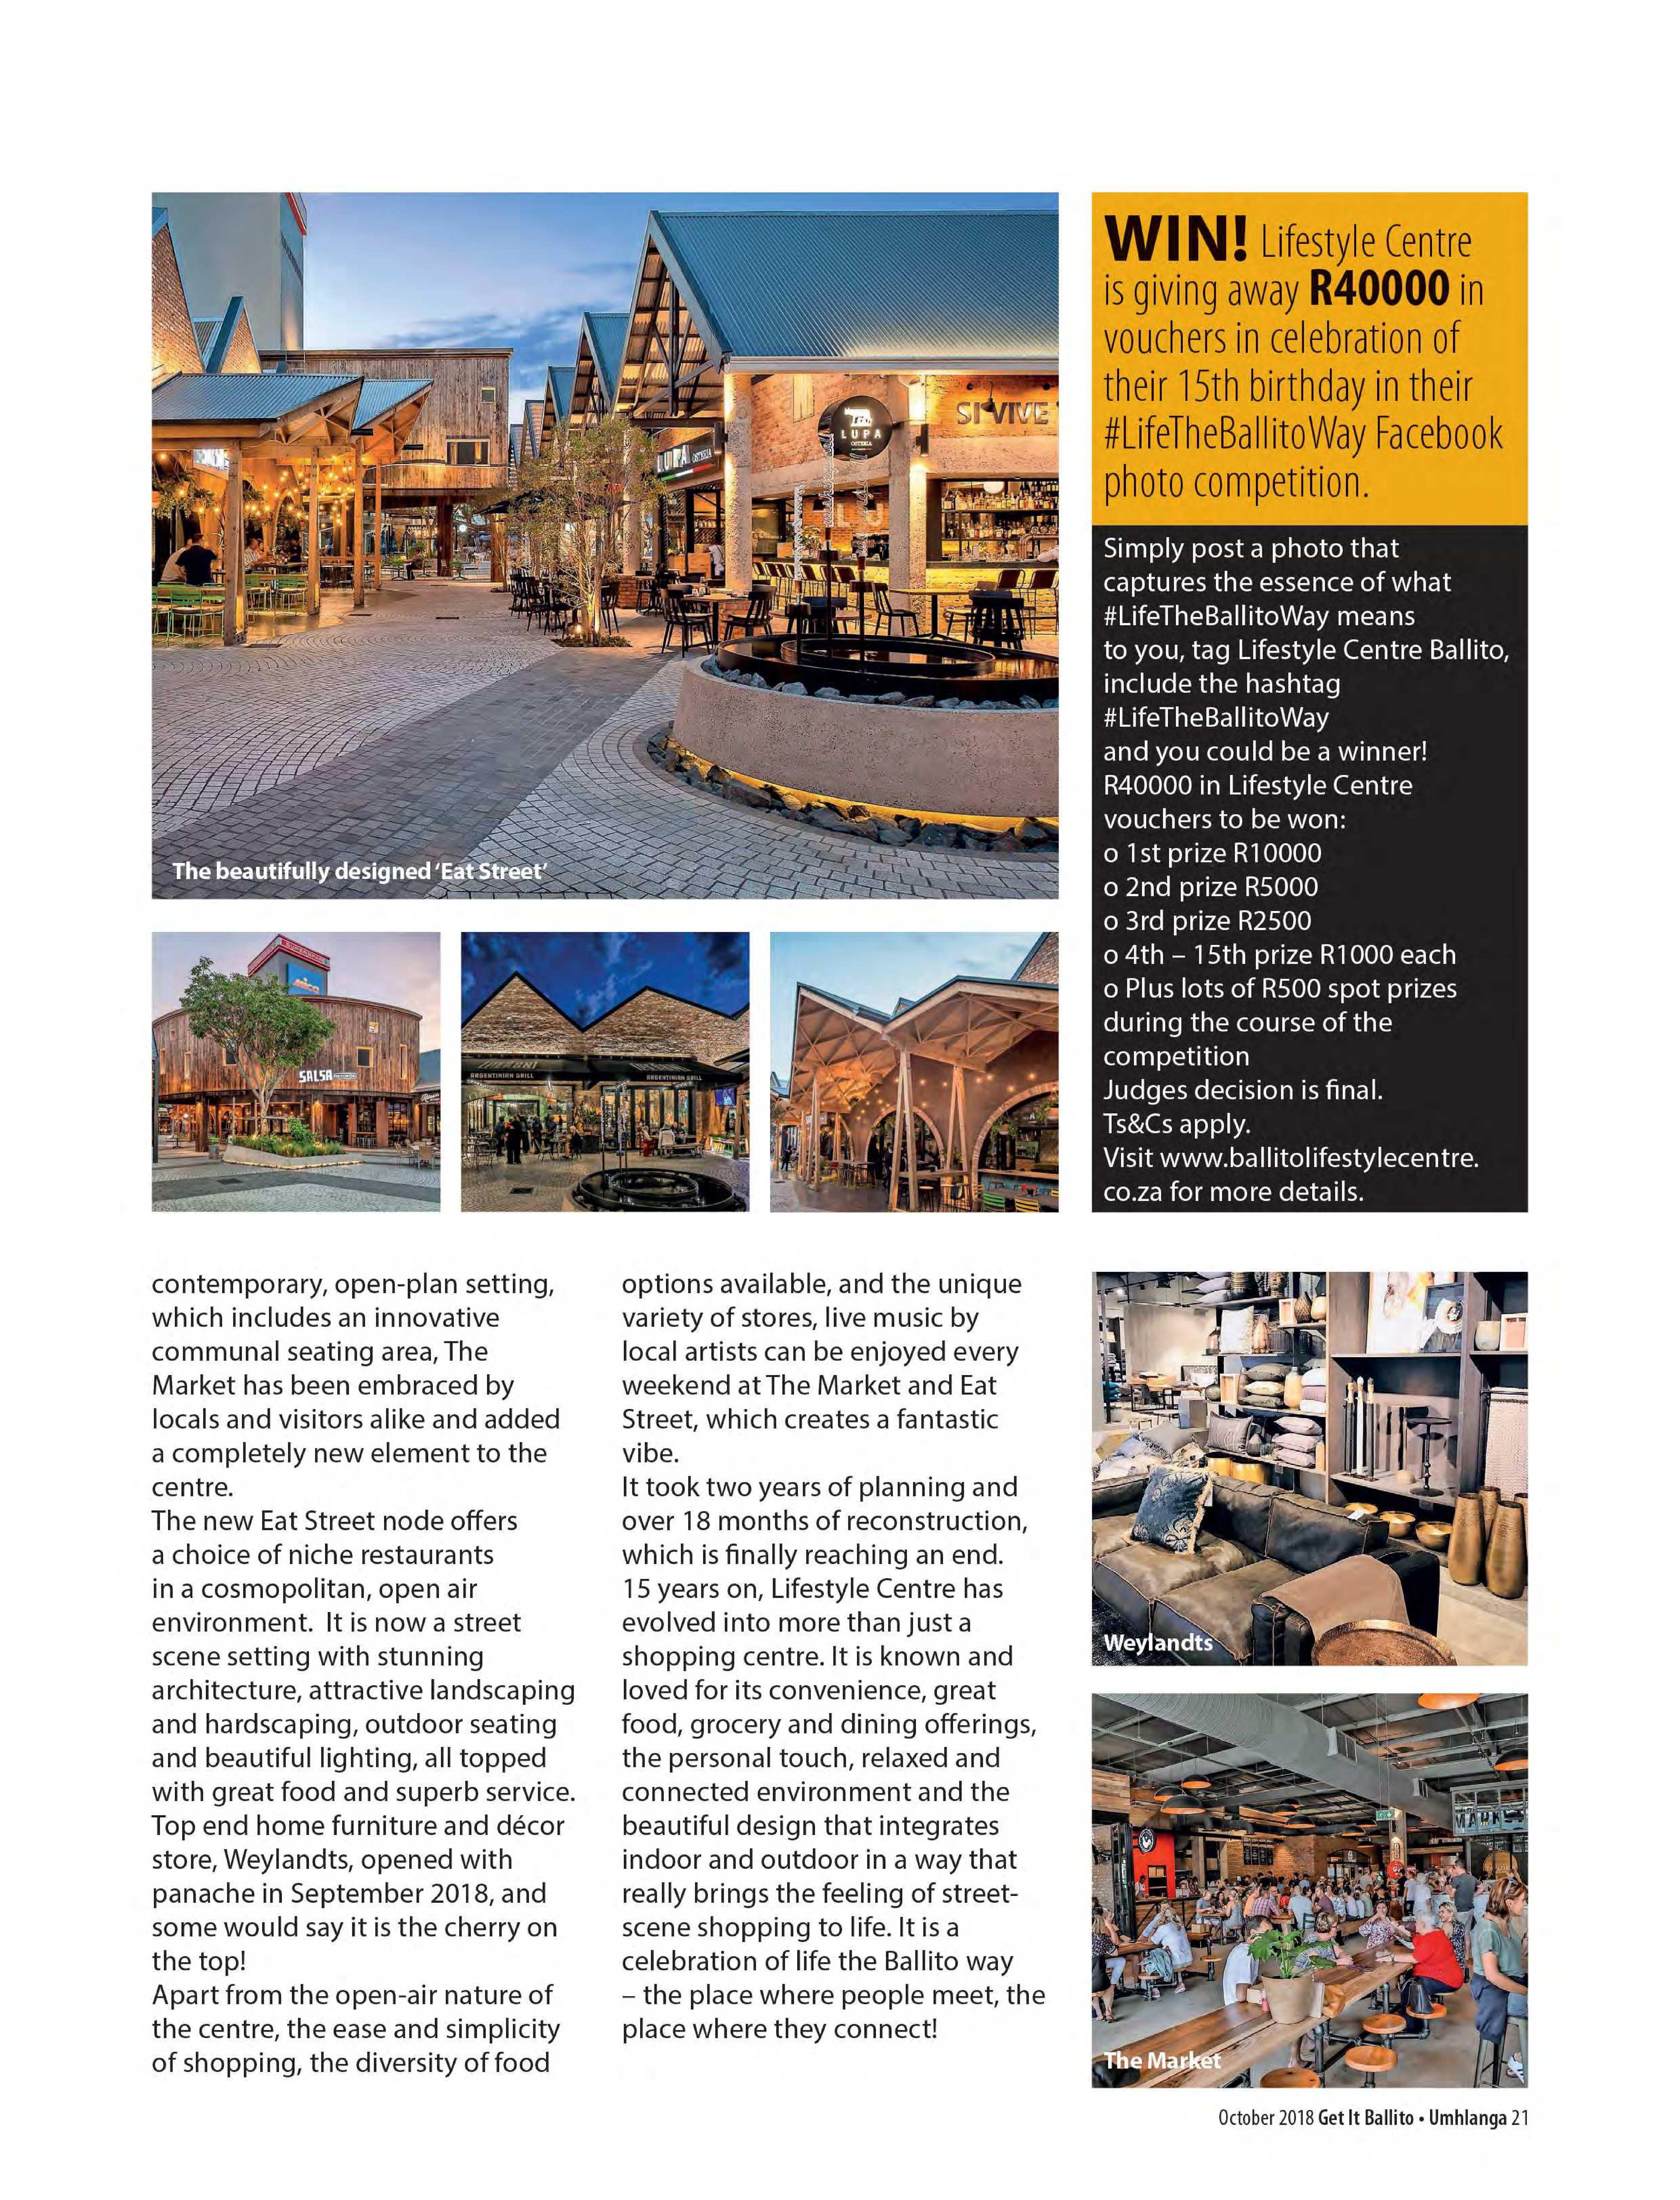 get-magazine-ballitoumhlanga-october-2018-epapers-page-23